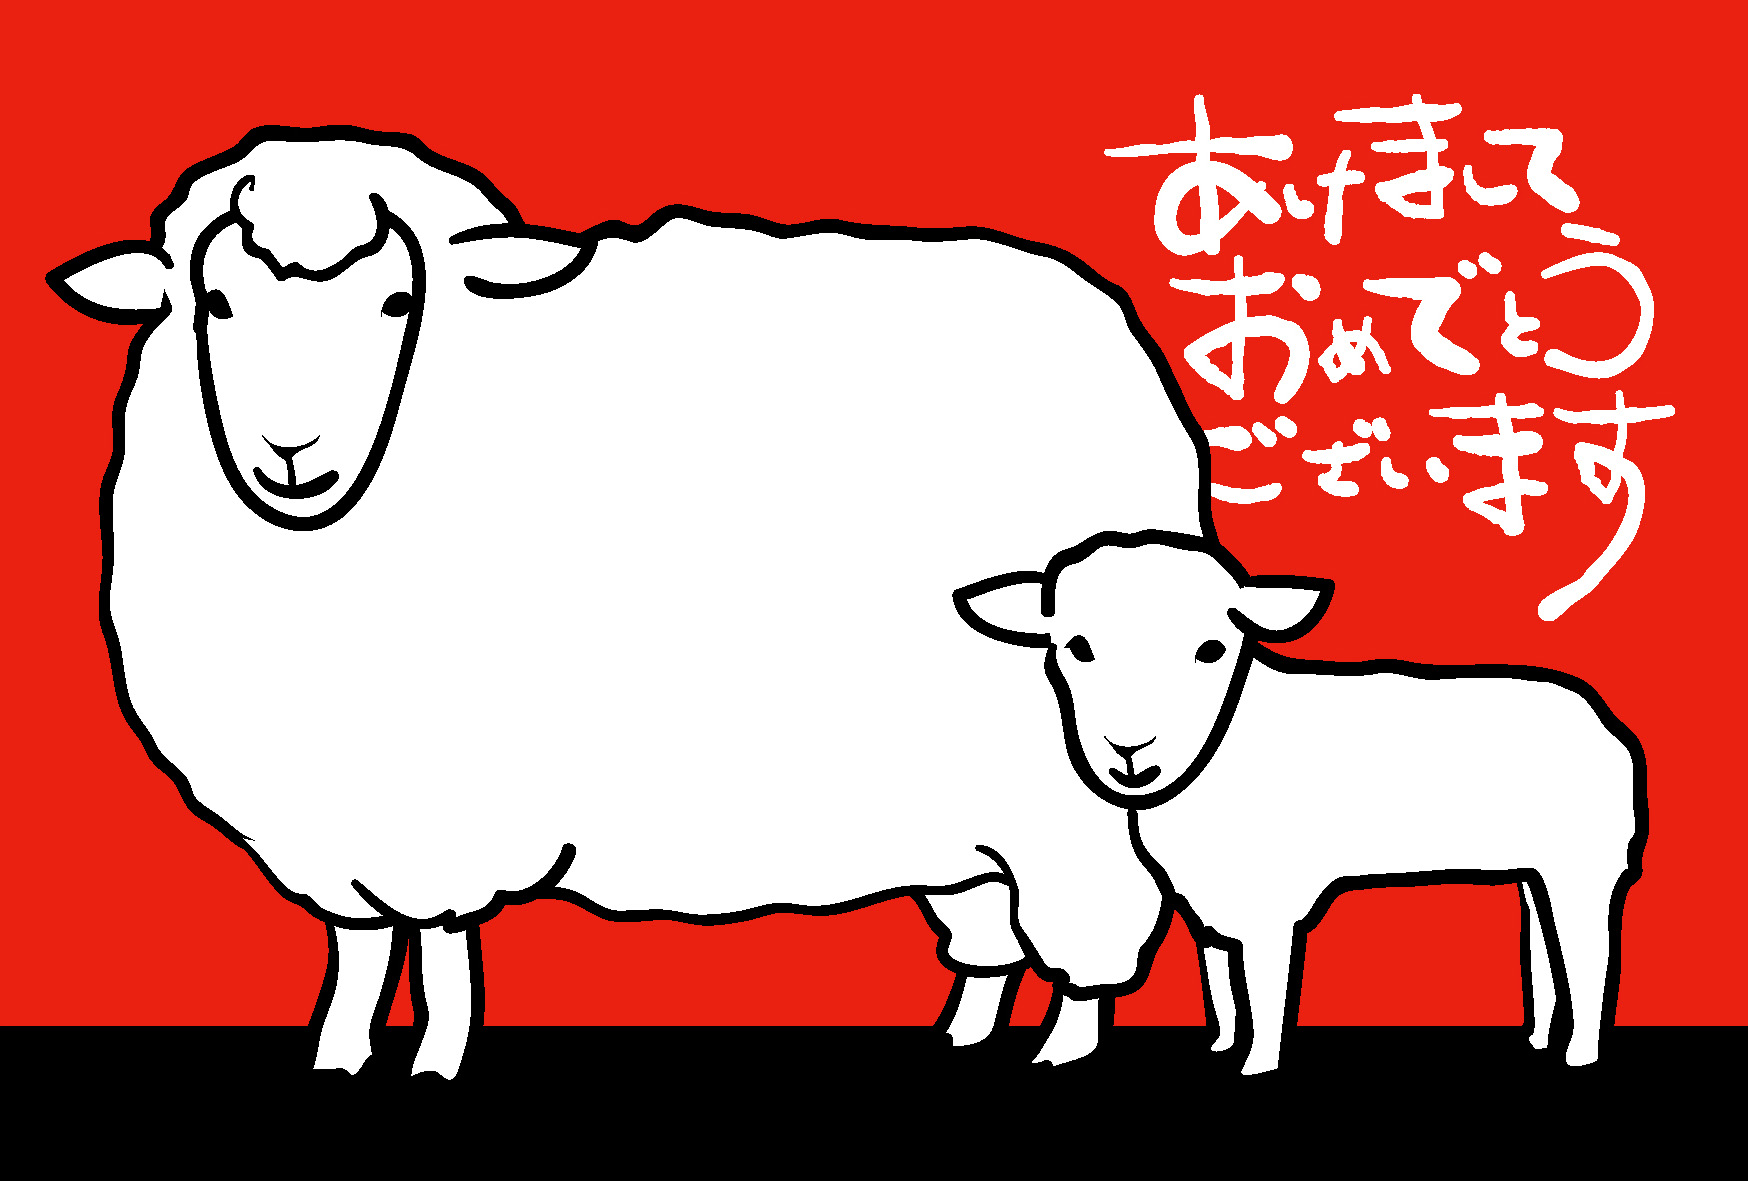 印刷素材-年賀状テンプレート ... : 羊 年賀状 素材 : 年賀状